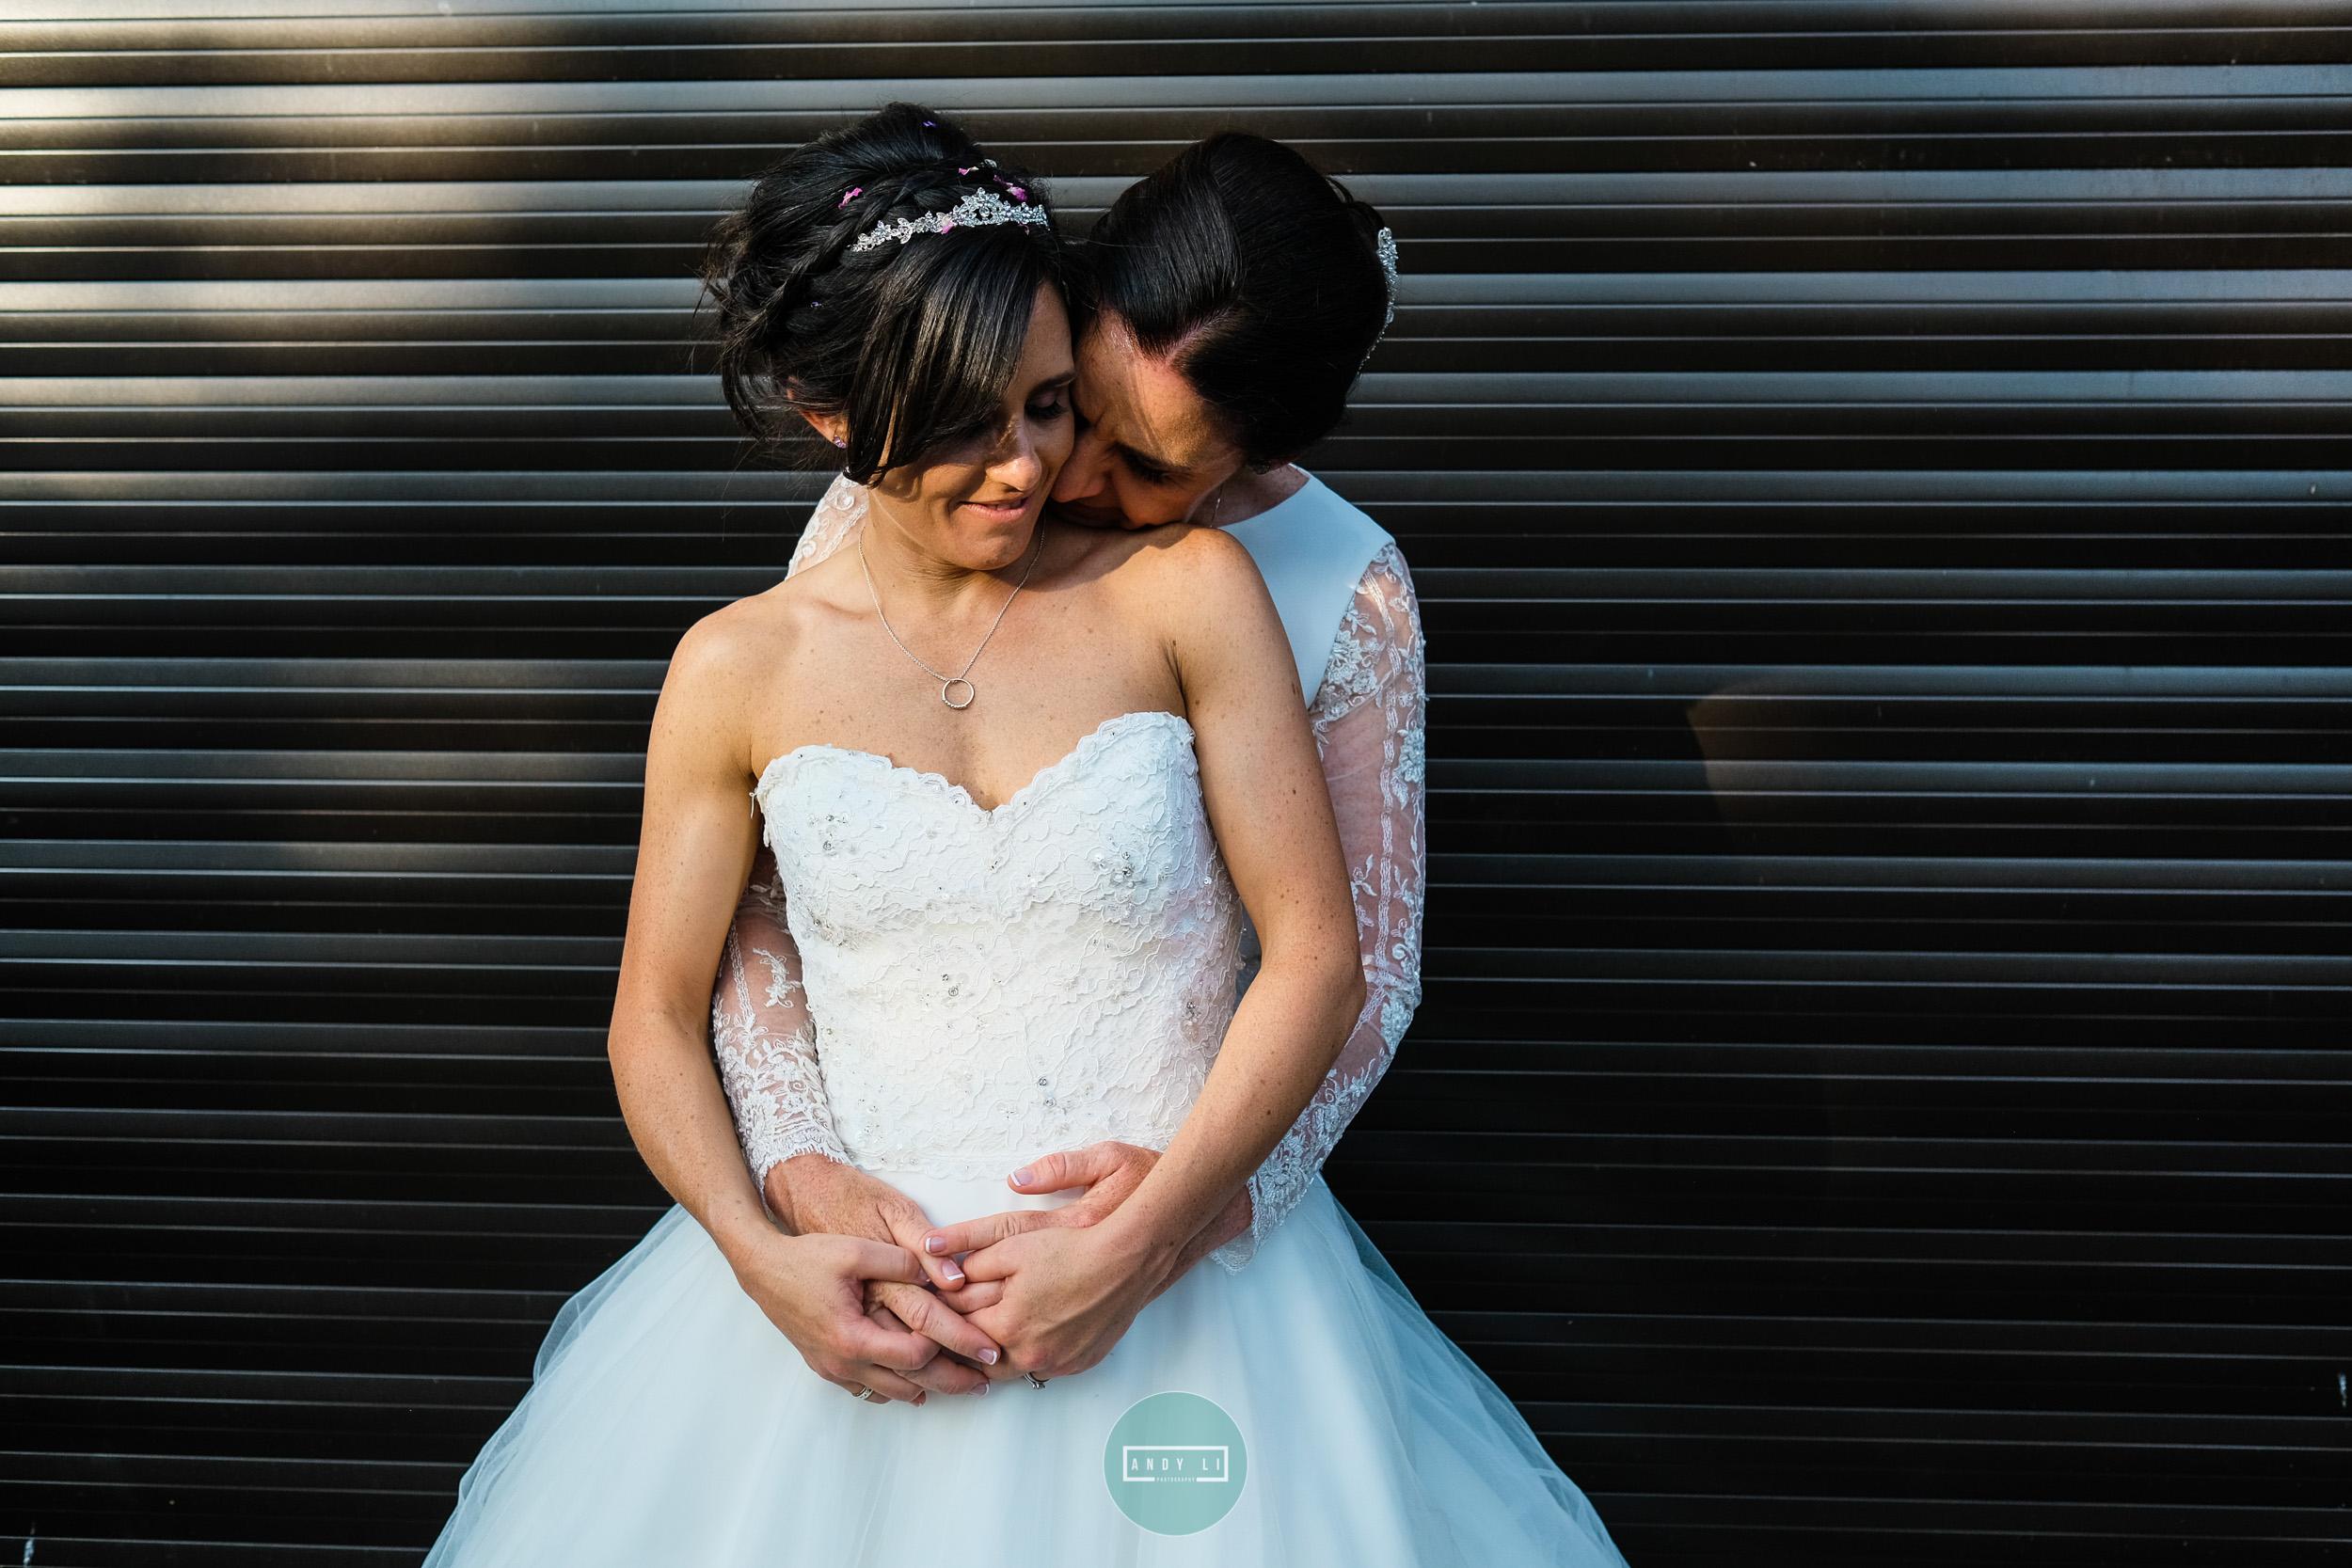 Manley Mere Cheshire Wedding Photographer-011-AXT21124.jpg